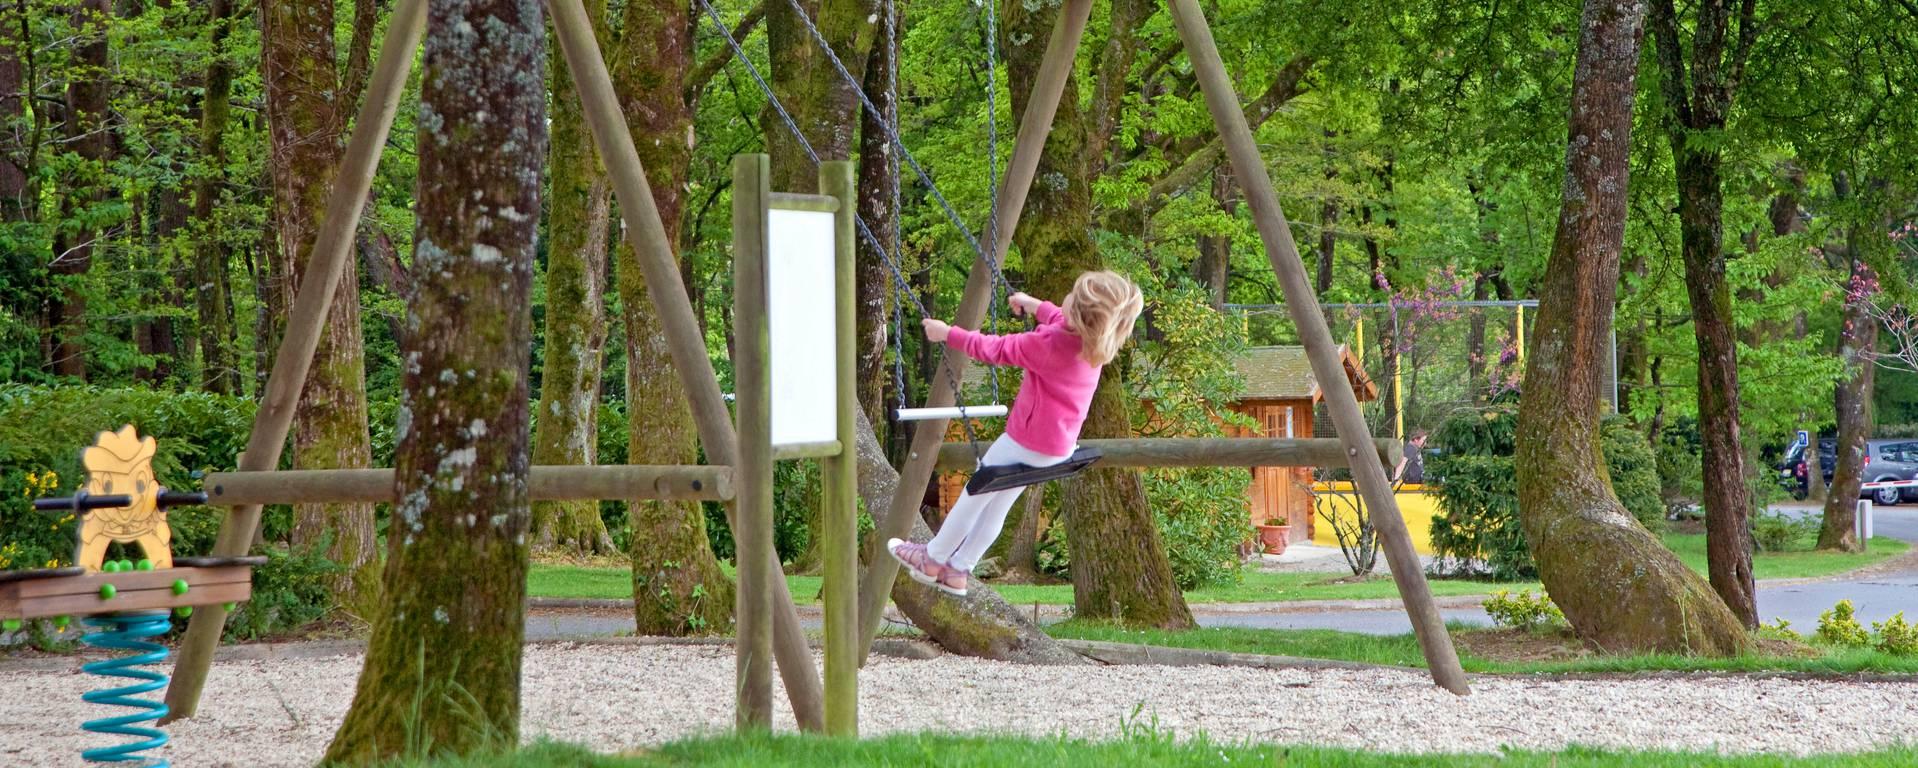 Children's playground © Franck Hamel - CRTB